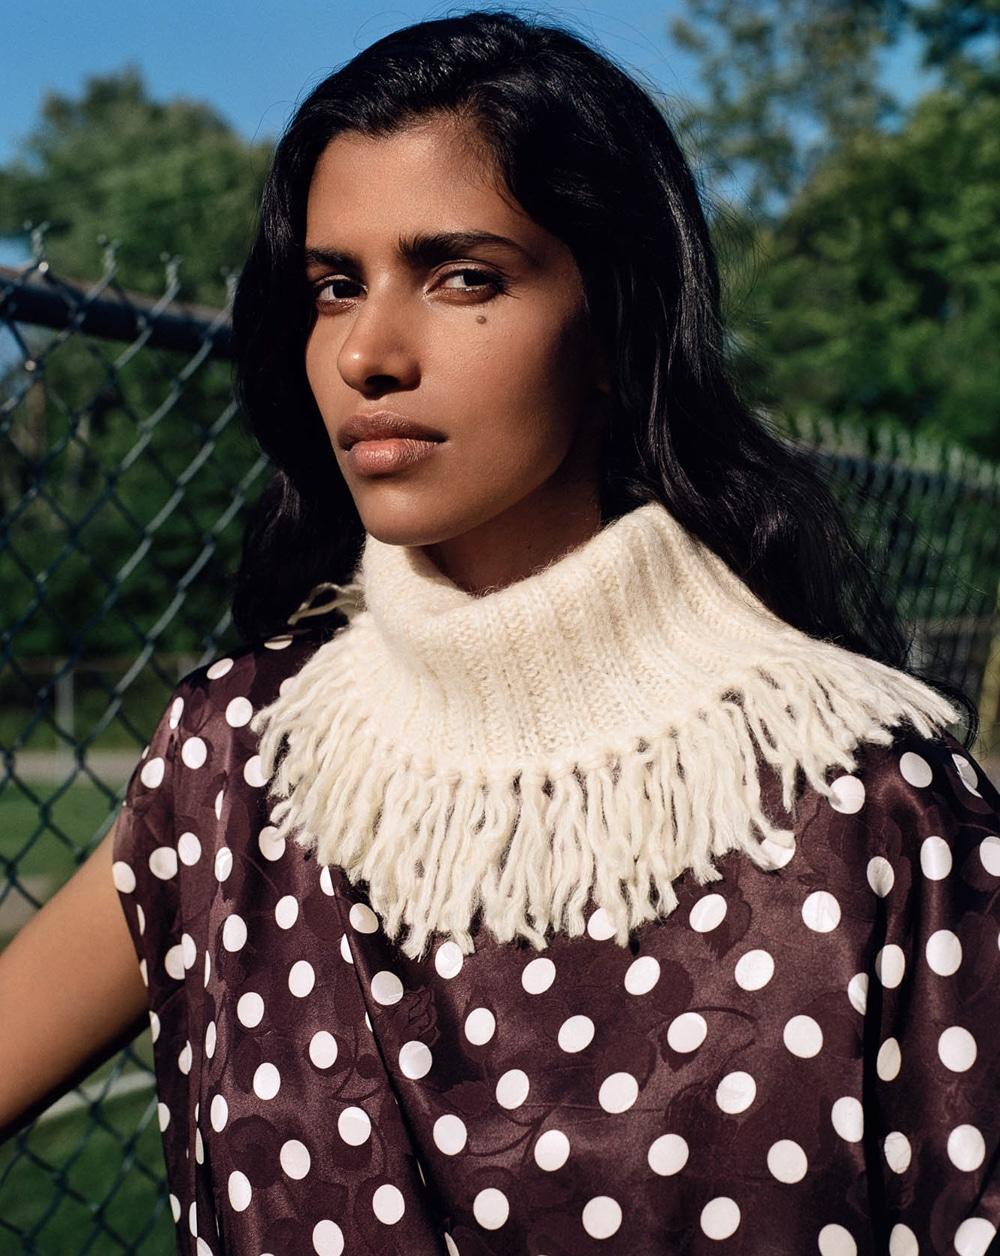 Vogue-Russia-Pooja-Mor-Buzz-White-10.jpg